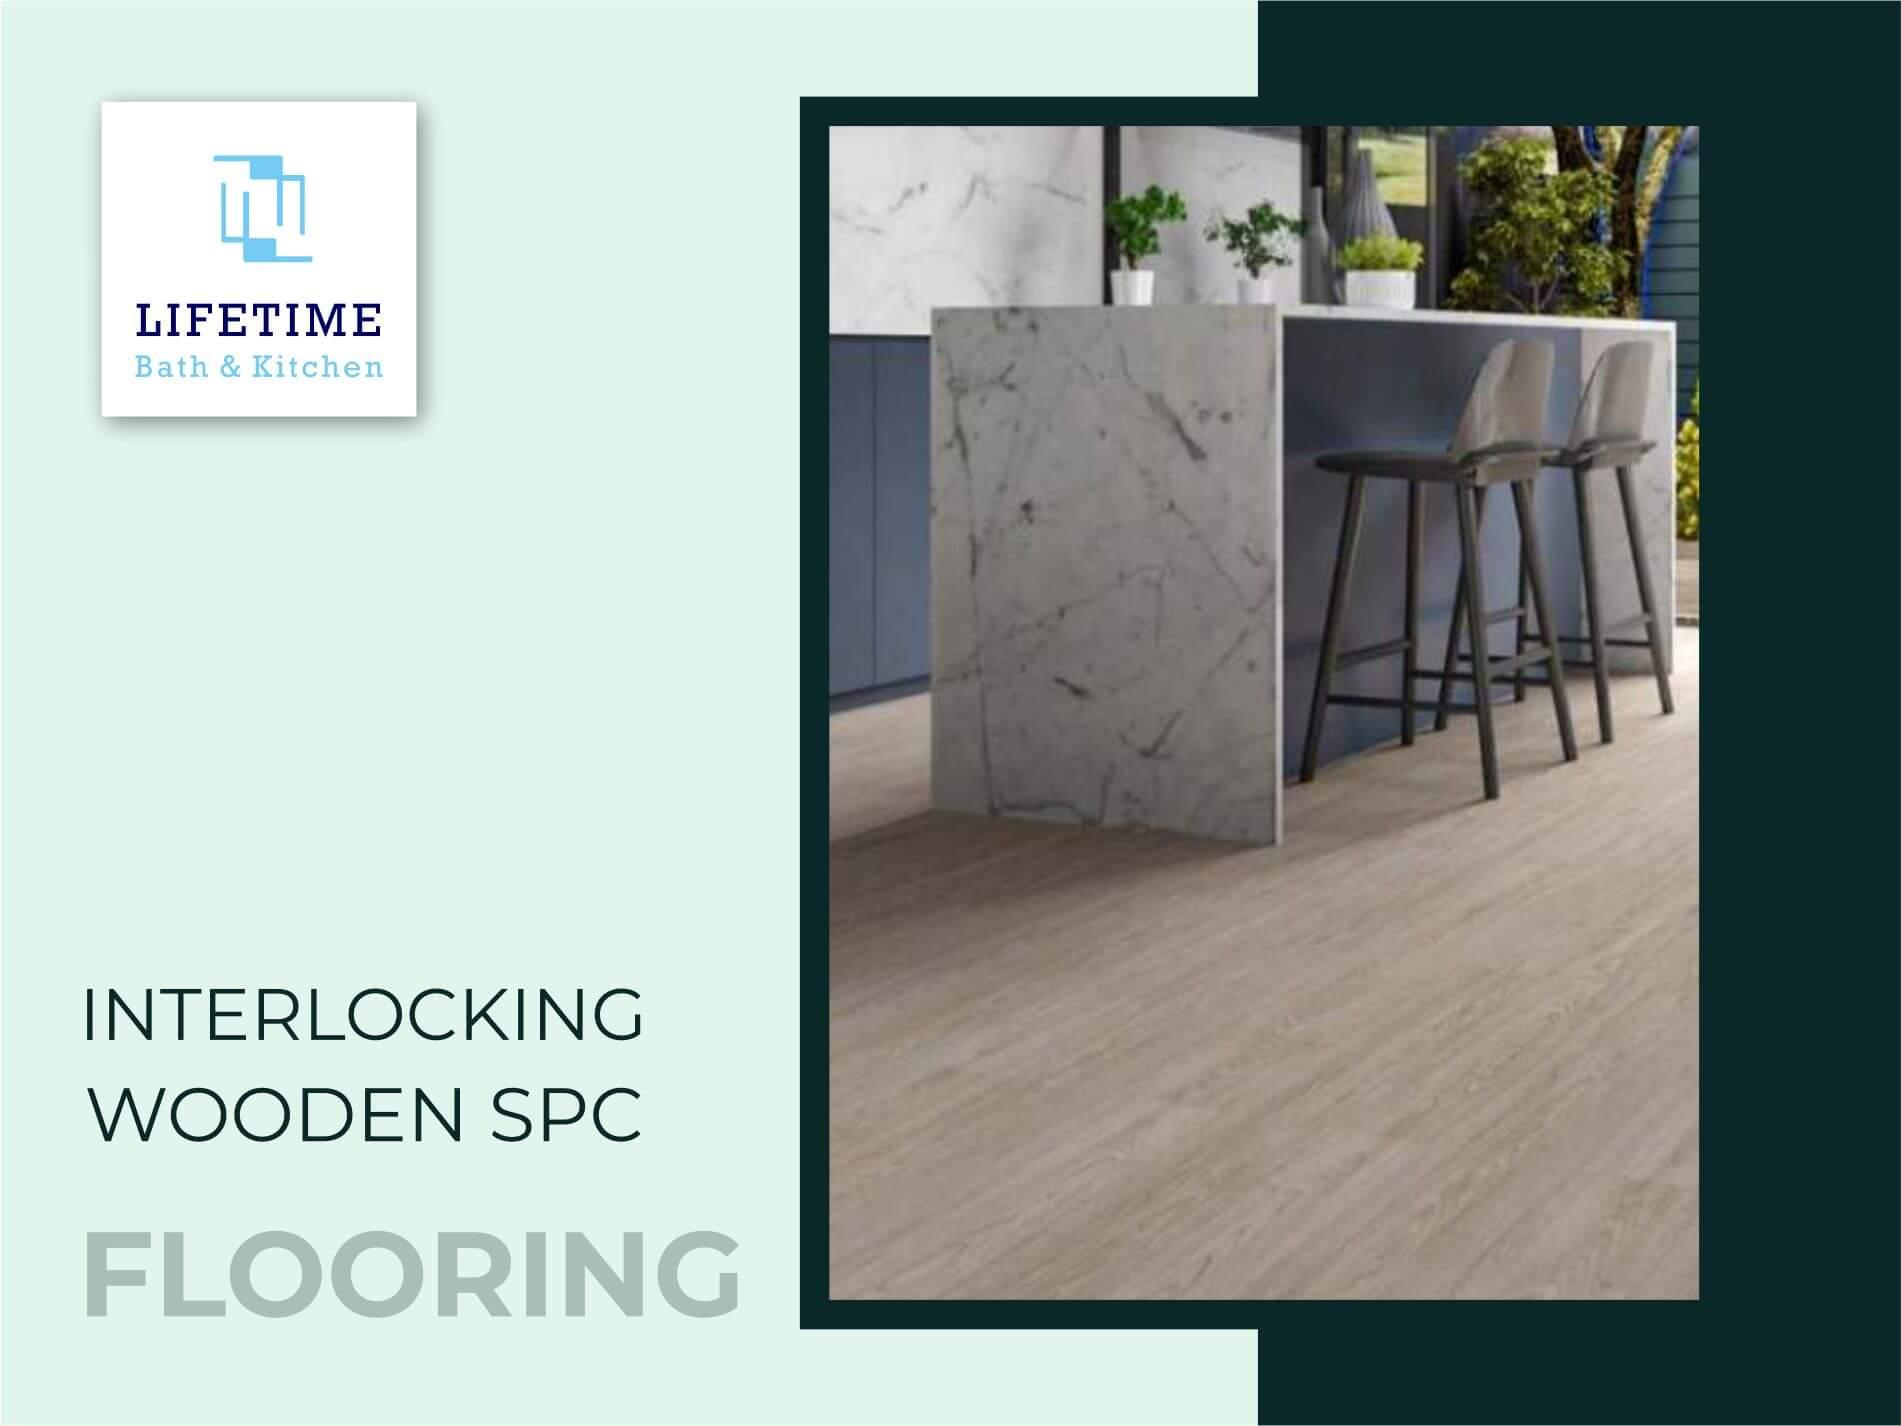 spc-flooring-page (2)